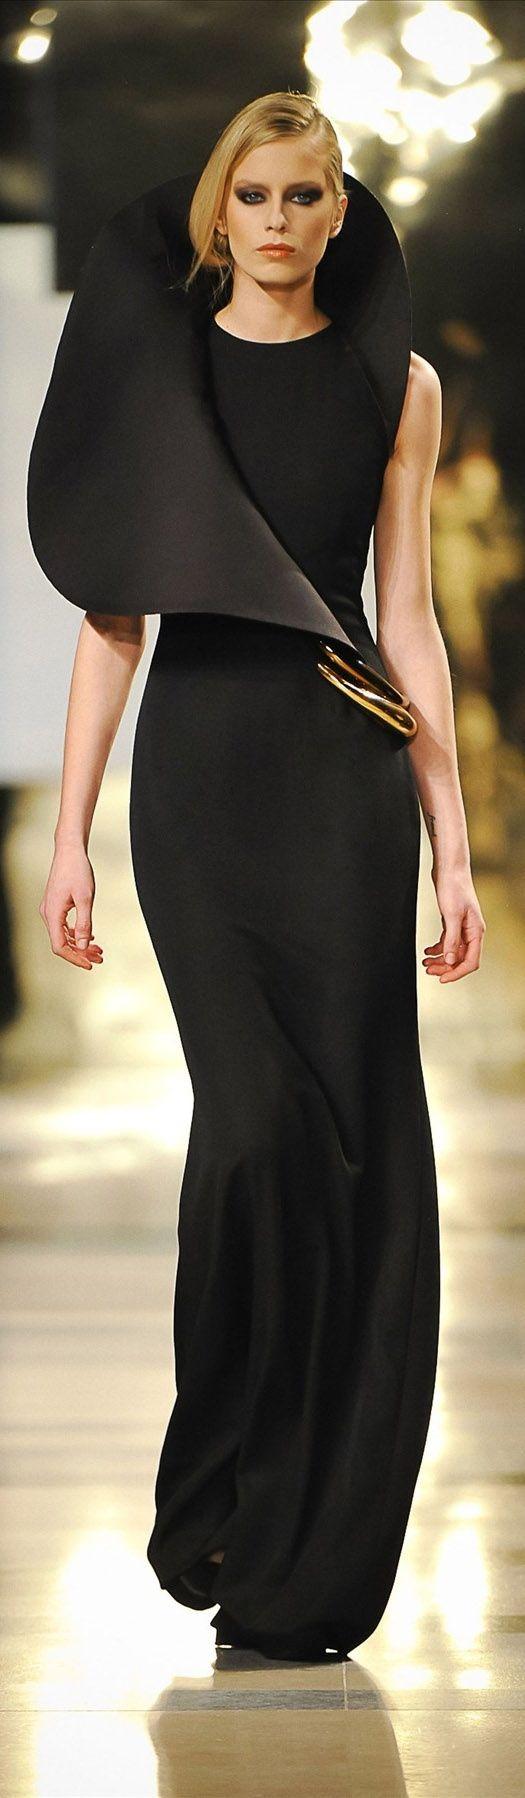 Stéphane Rolland, 2011, Haute Couture, Paris, future fashion, model, fashion girl, futuristic look, black dress, black clothes,girl in black by FuturisticNews.com